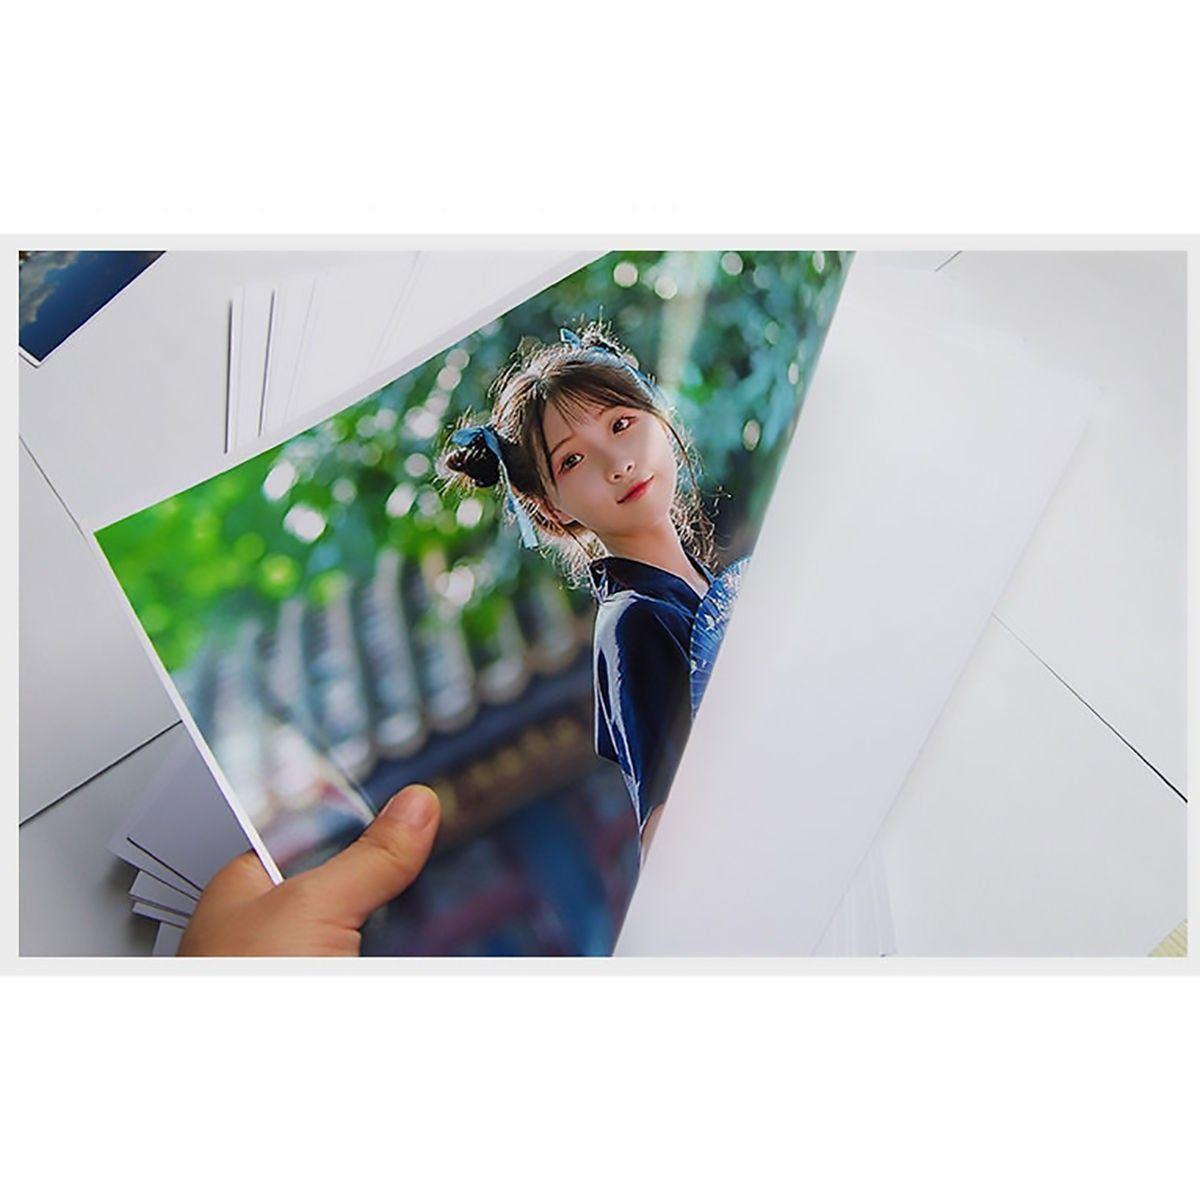 Papel Fotográfico A4 Dupla Face 180g Glossy Branco Brilhante Resistente à Água / 500 folhas